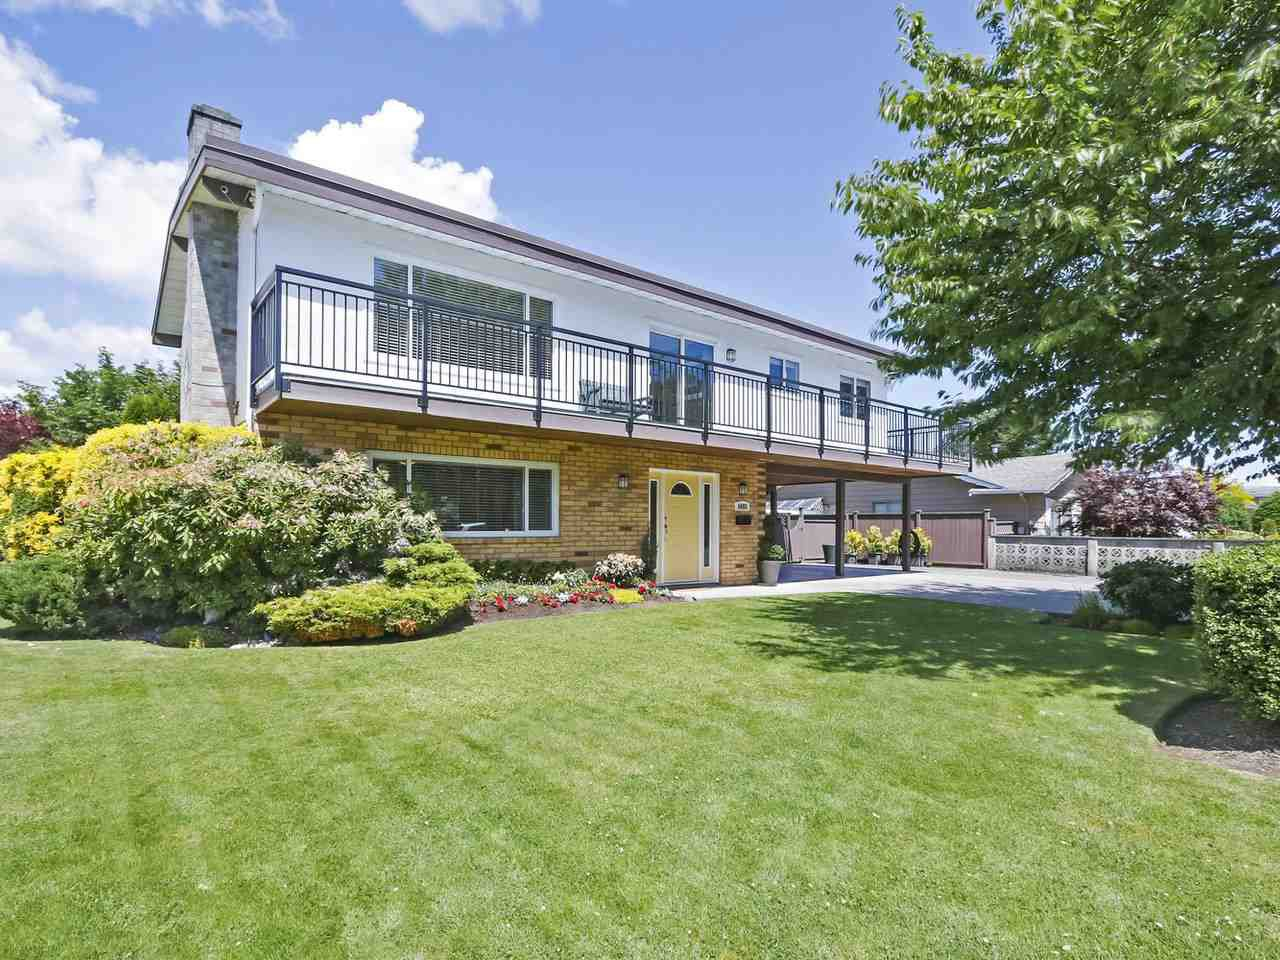 Main Photo: 5403 47 Avenue in Delta: Delta Manor House for sale (Ladner)  : MLS®# R2378999